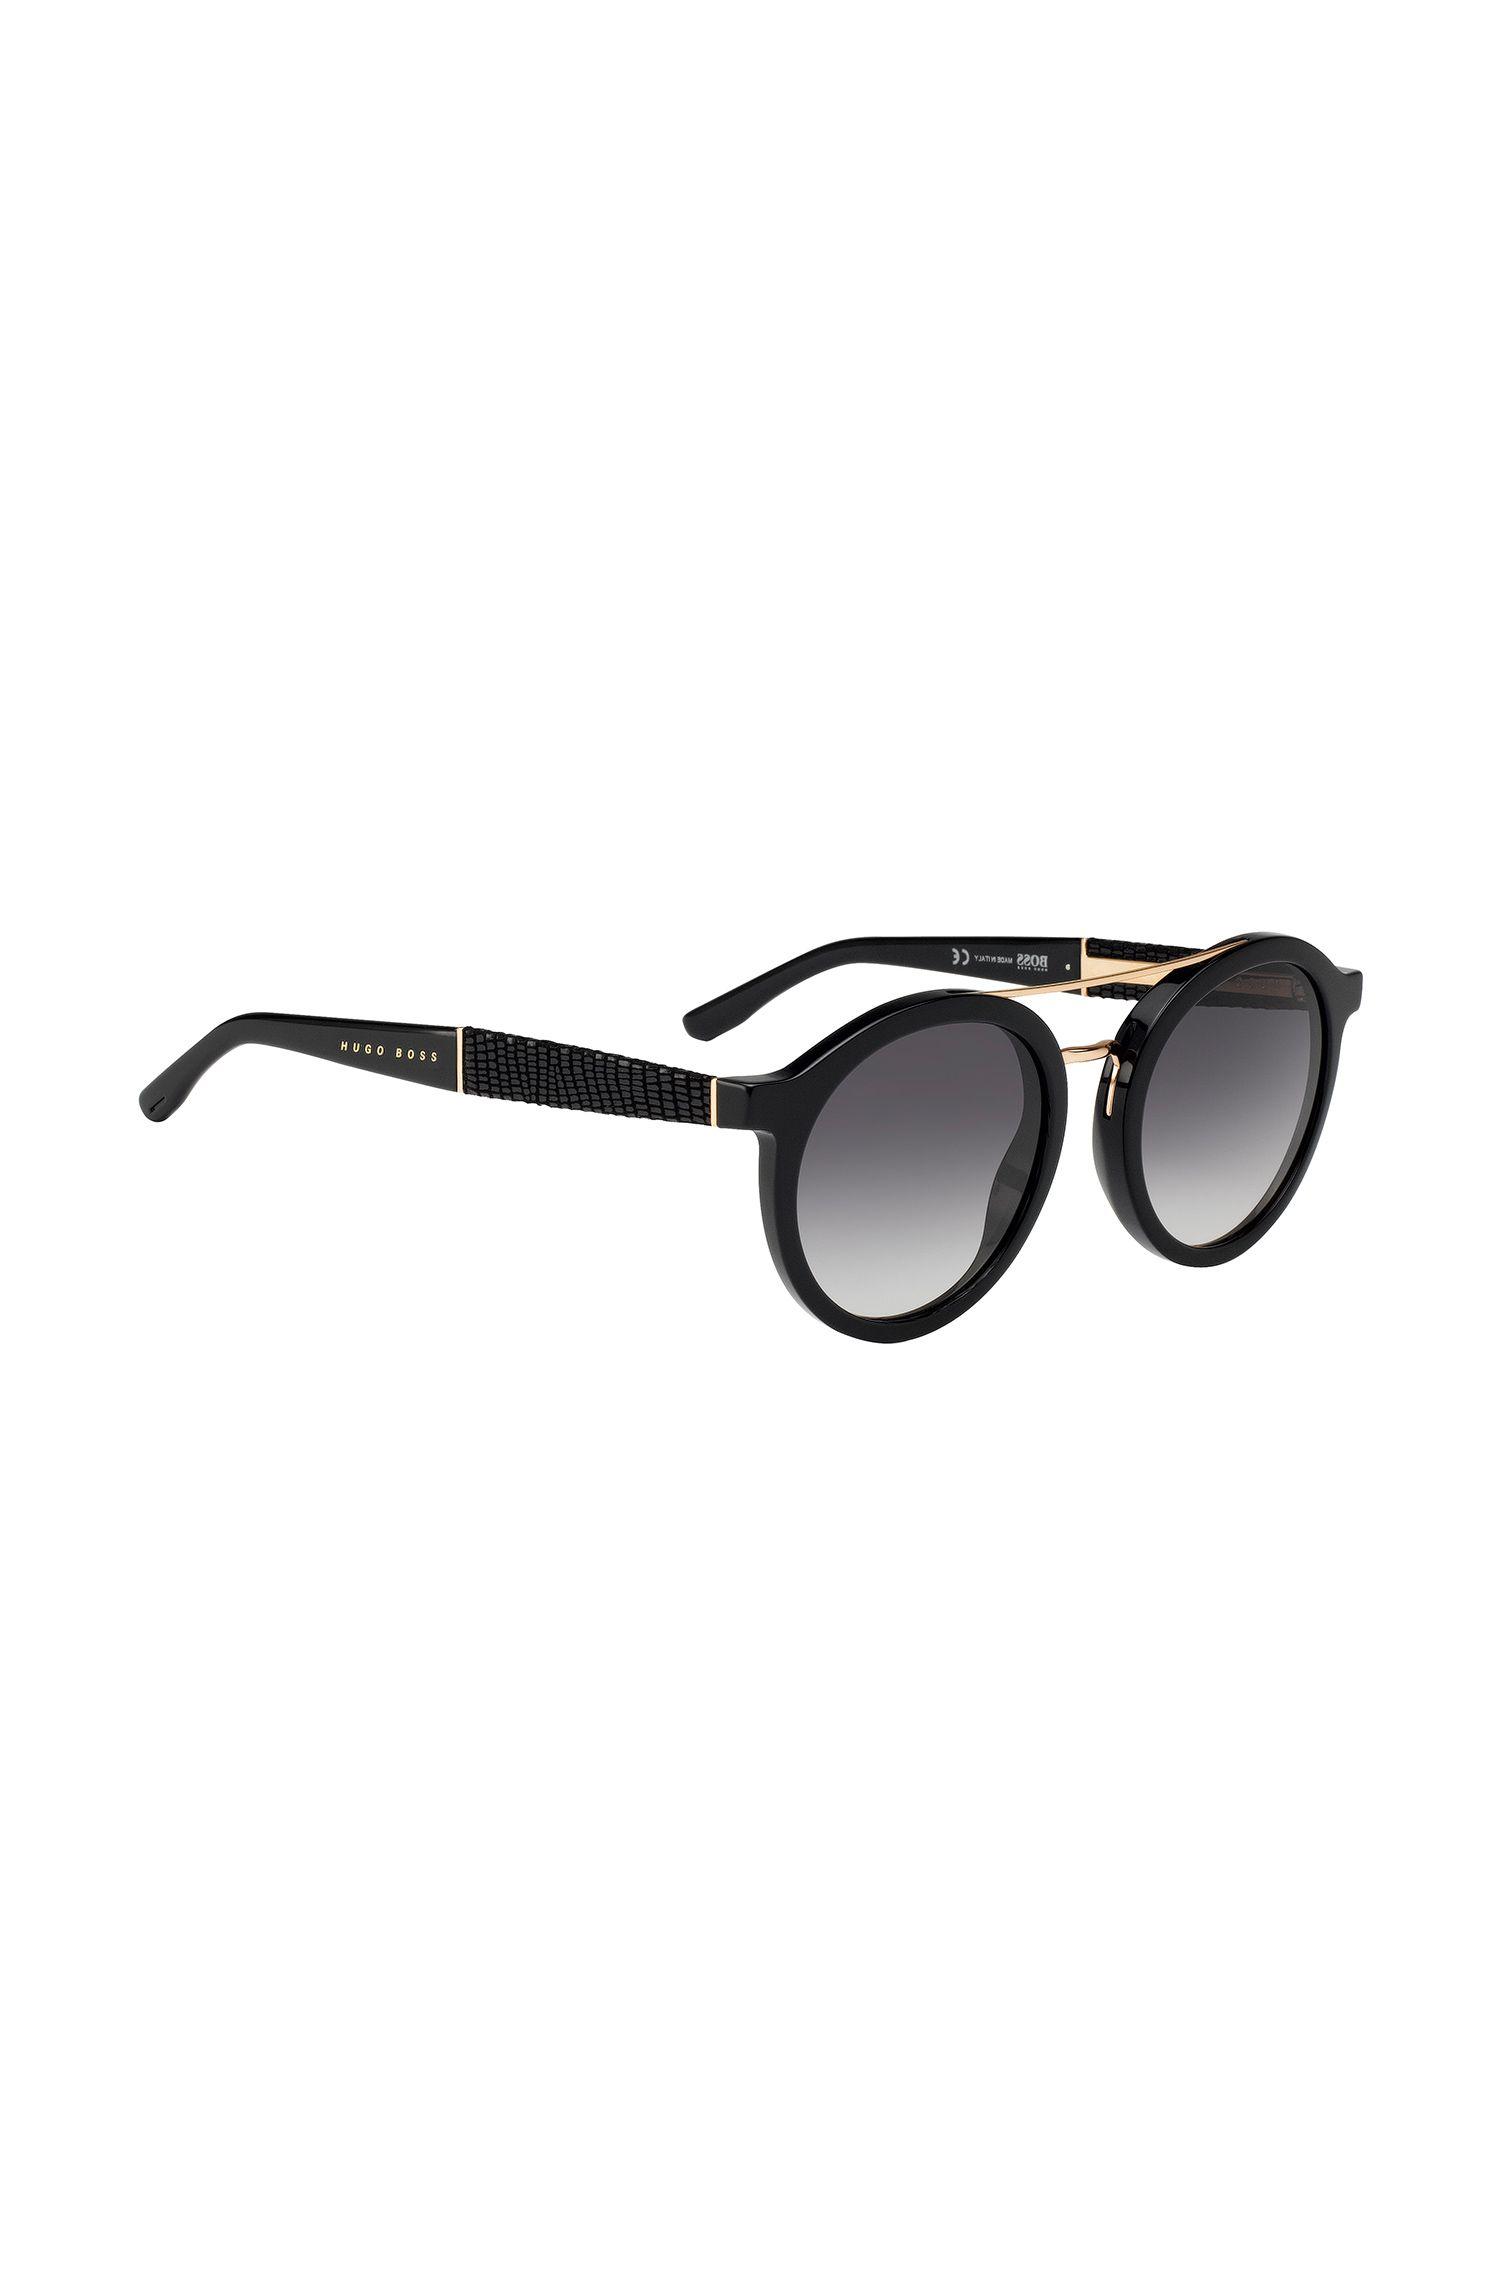 Round Gradient Lens Acetate Leather Sunglasses | BOSS 0853S